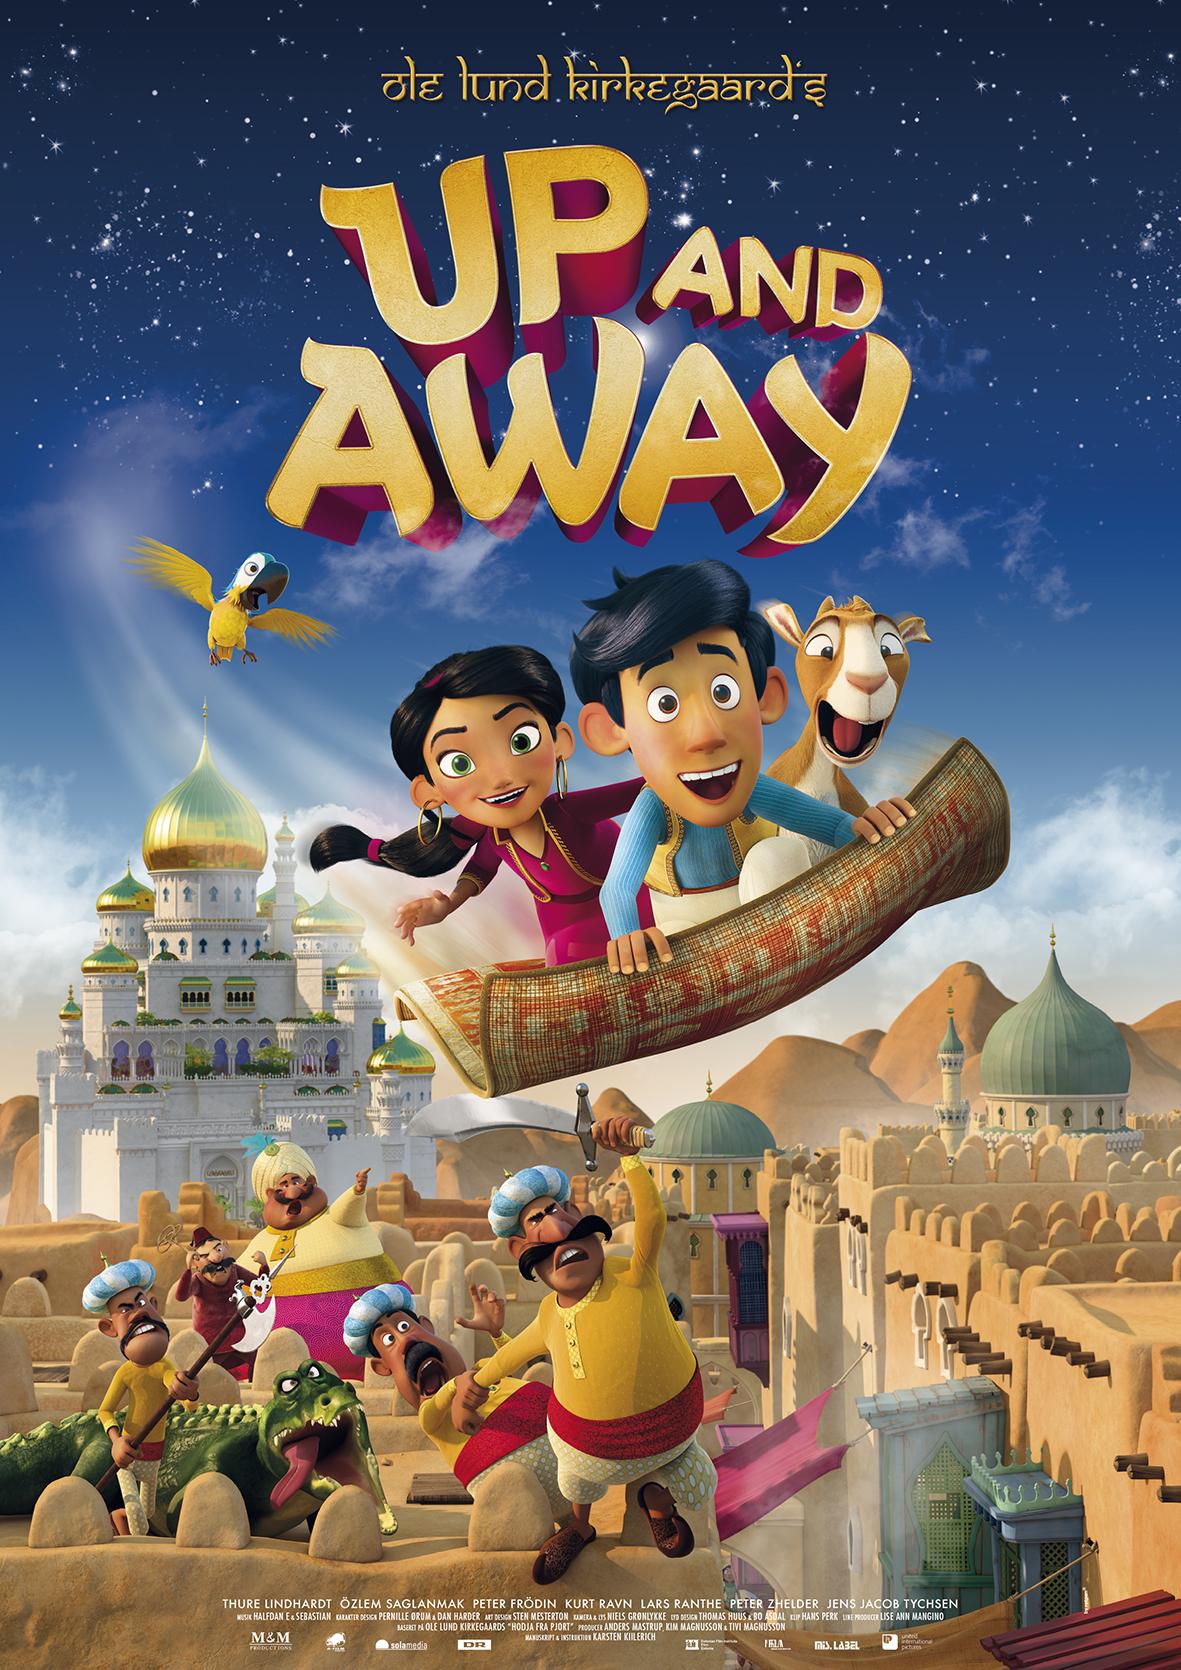 Up And Away 2018 Hindi Dubbed 720p HDRip ESub 500MB Download